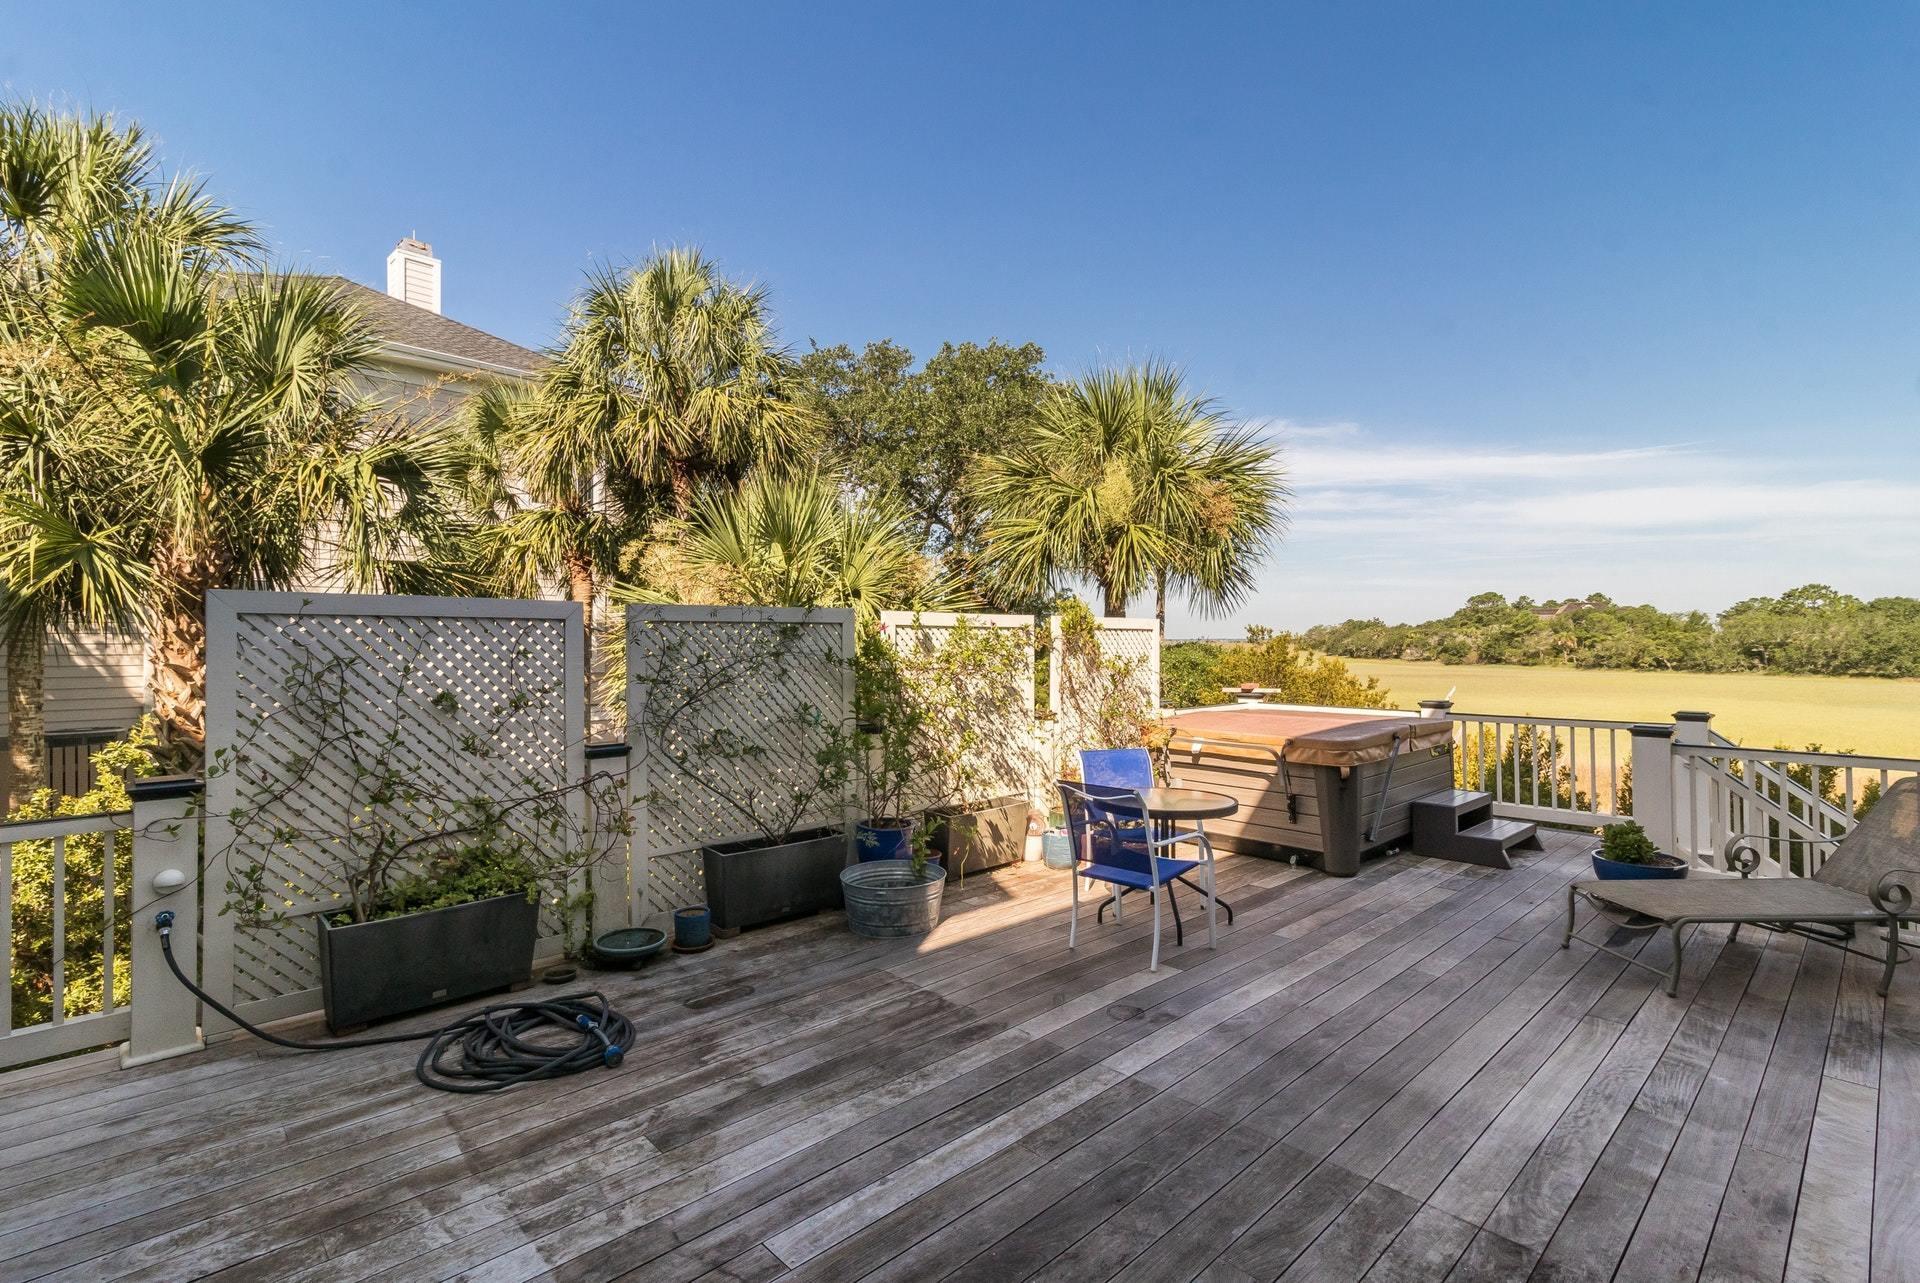 27 Seagrass Lane Isle Of Palms, SC 29451